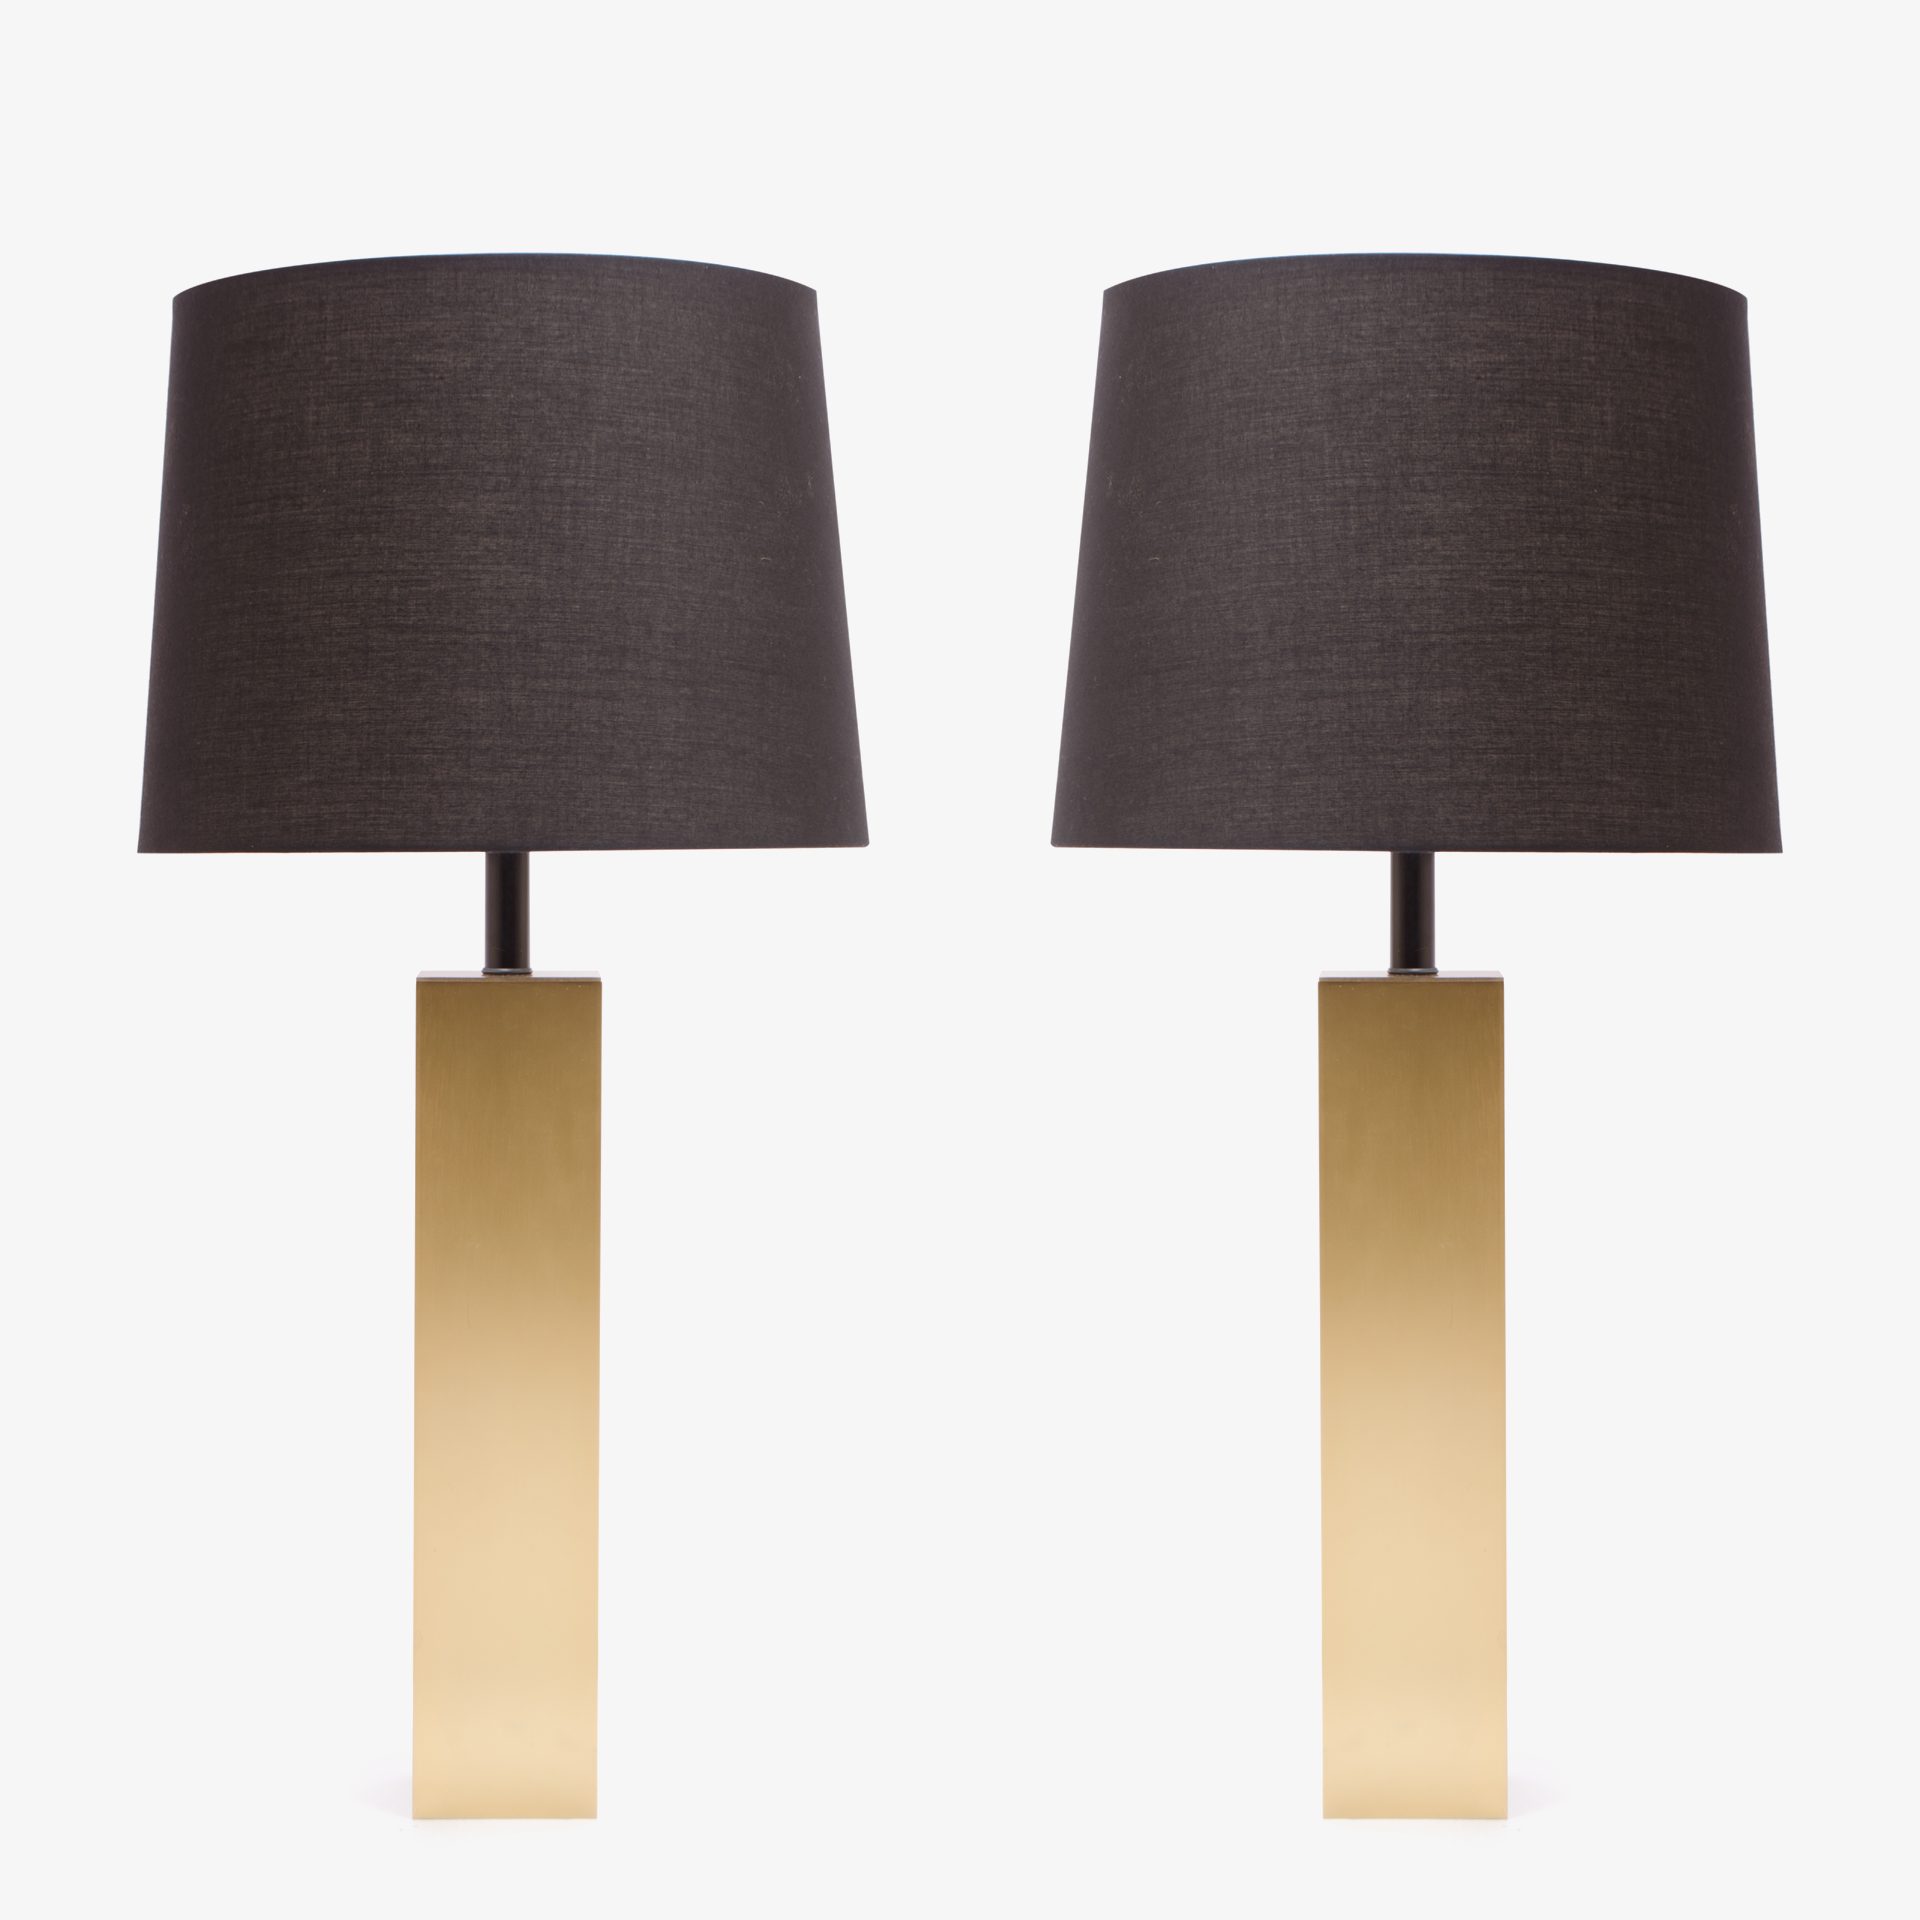 Minimalist Brushed Brass Lamps